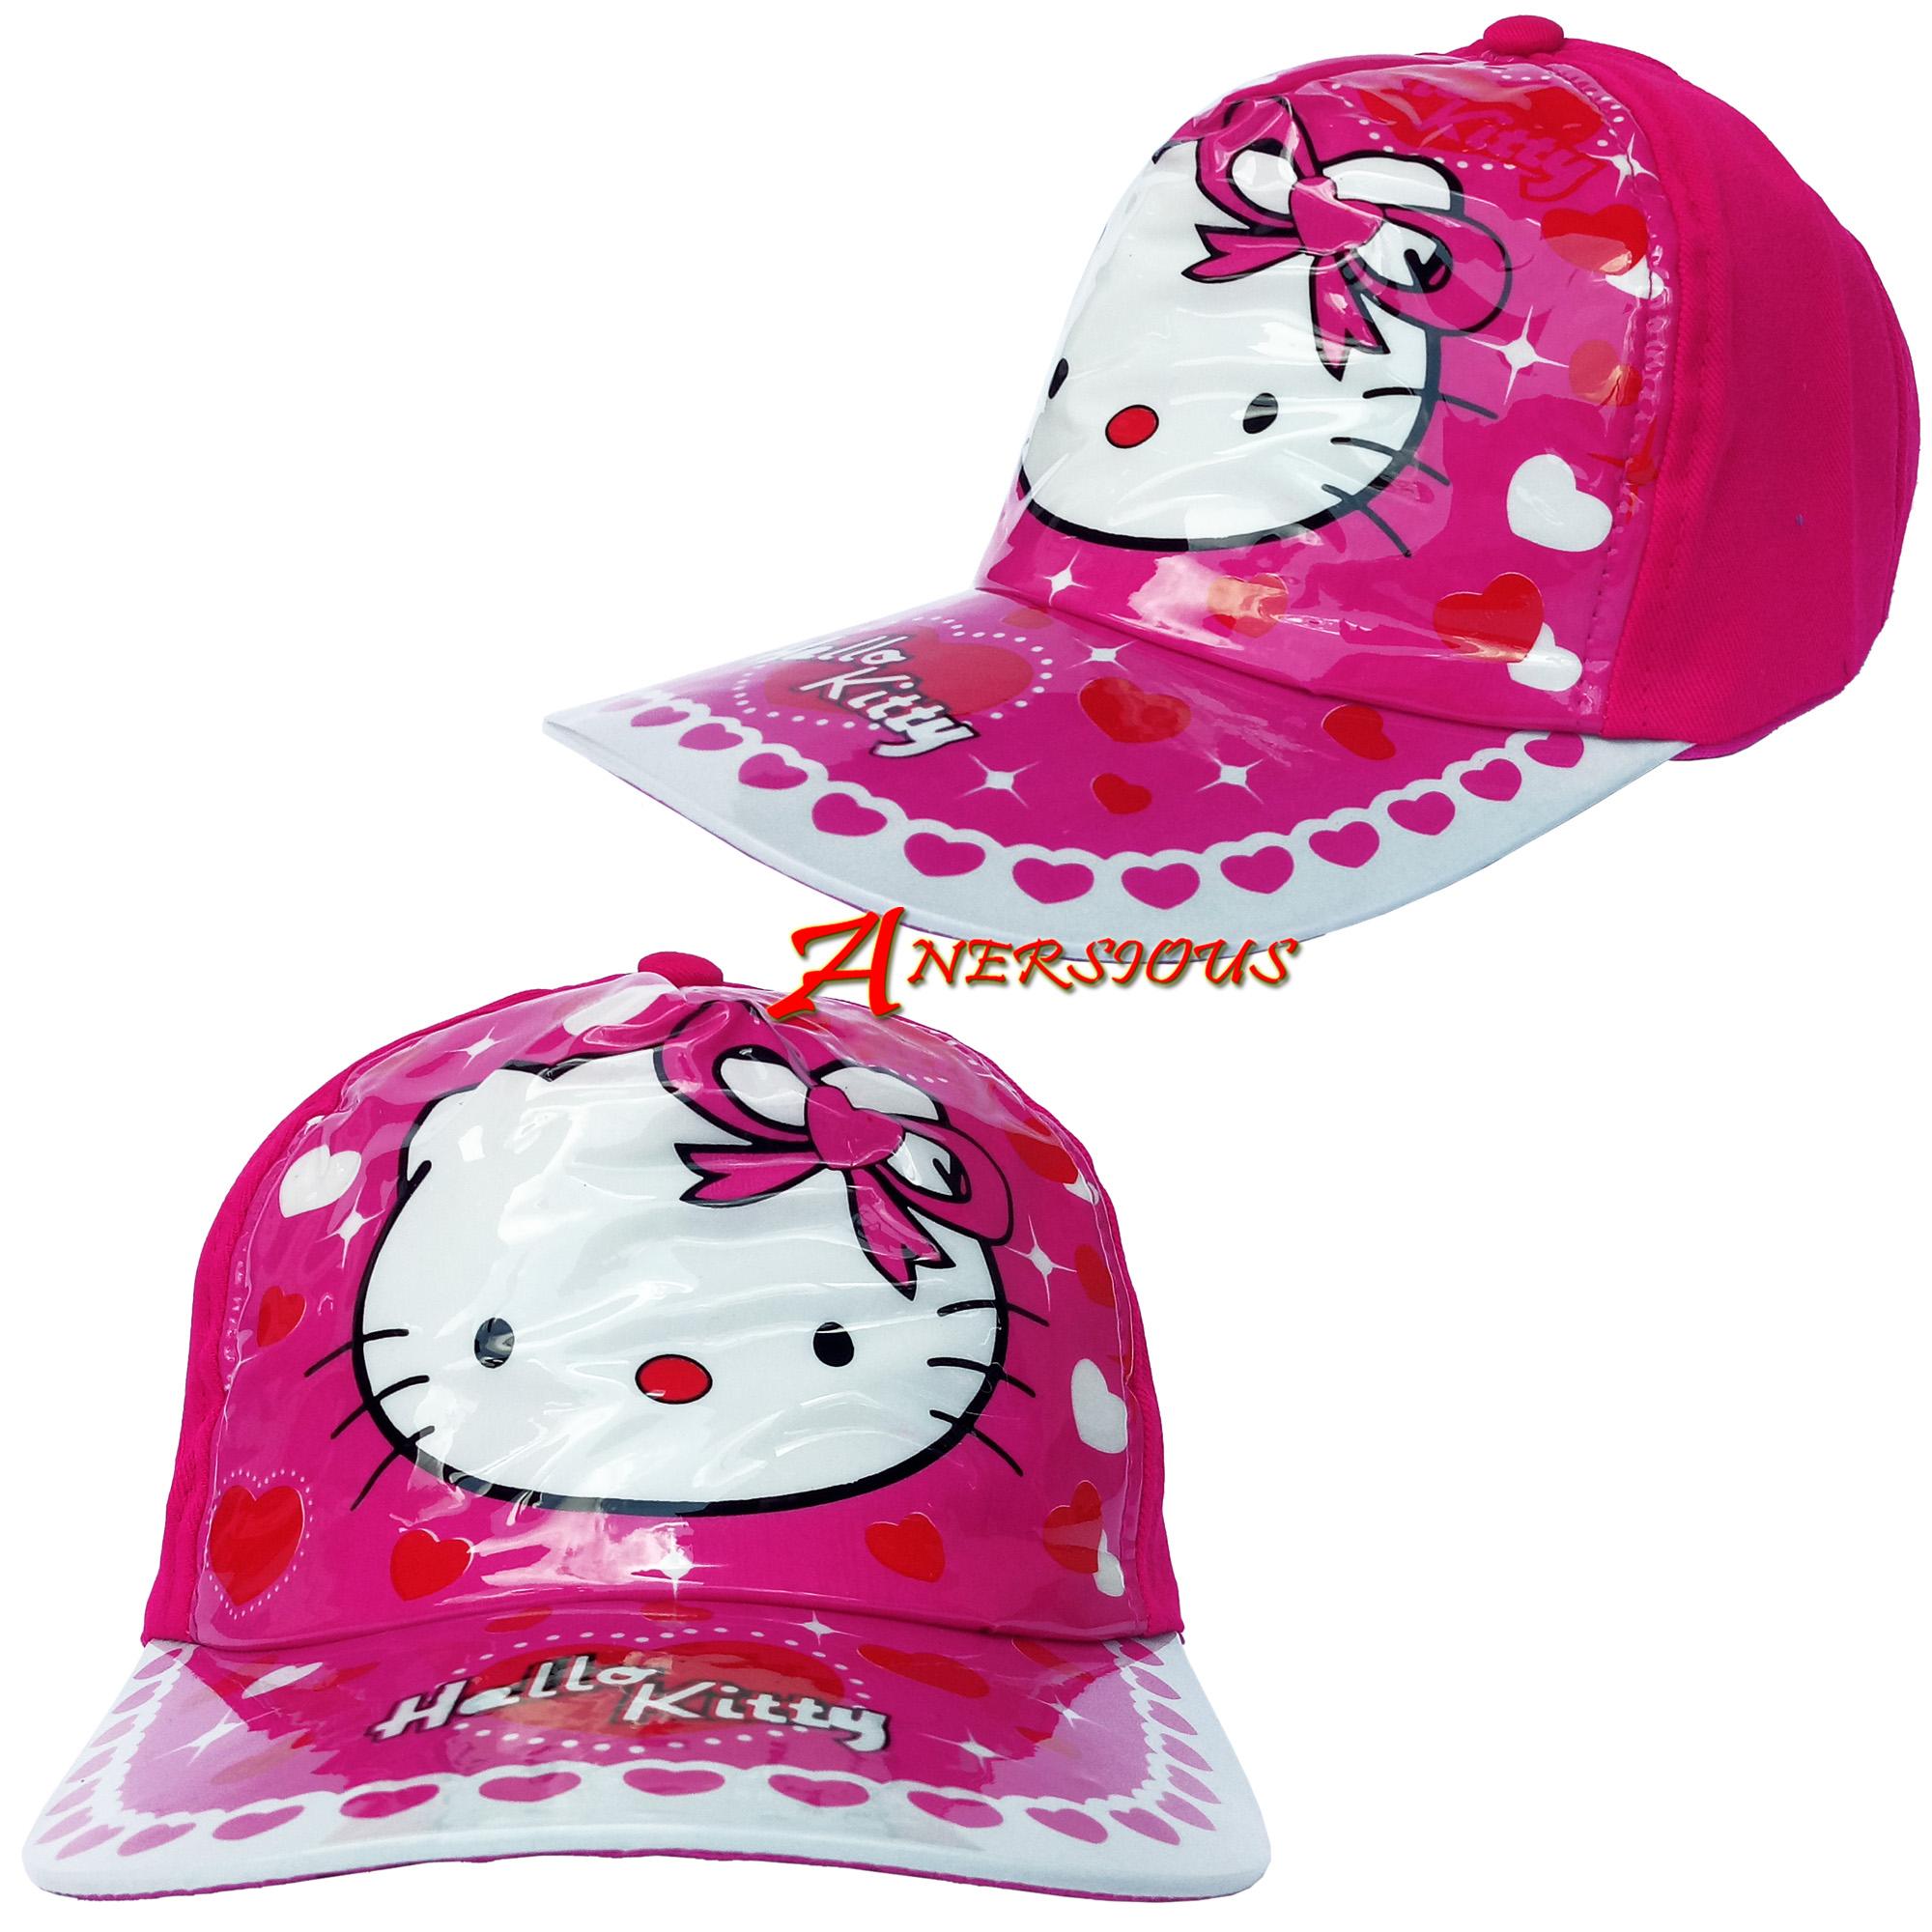 Topi Mika Anak Snapback Topi Anak Dengan Desain Karakter Hello Kitty Lucu